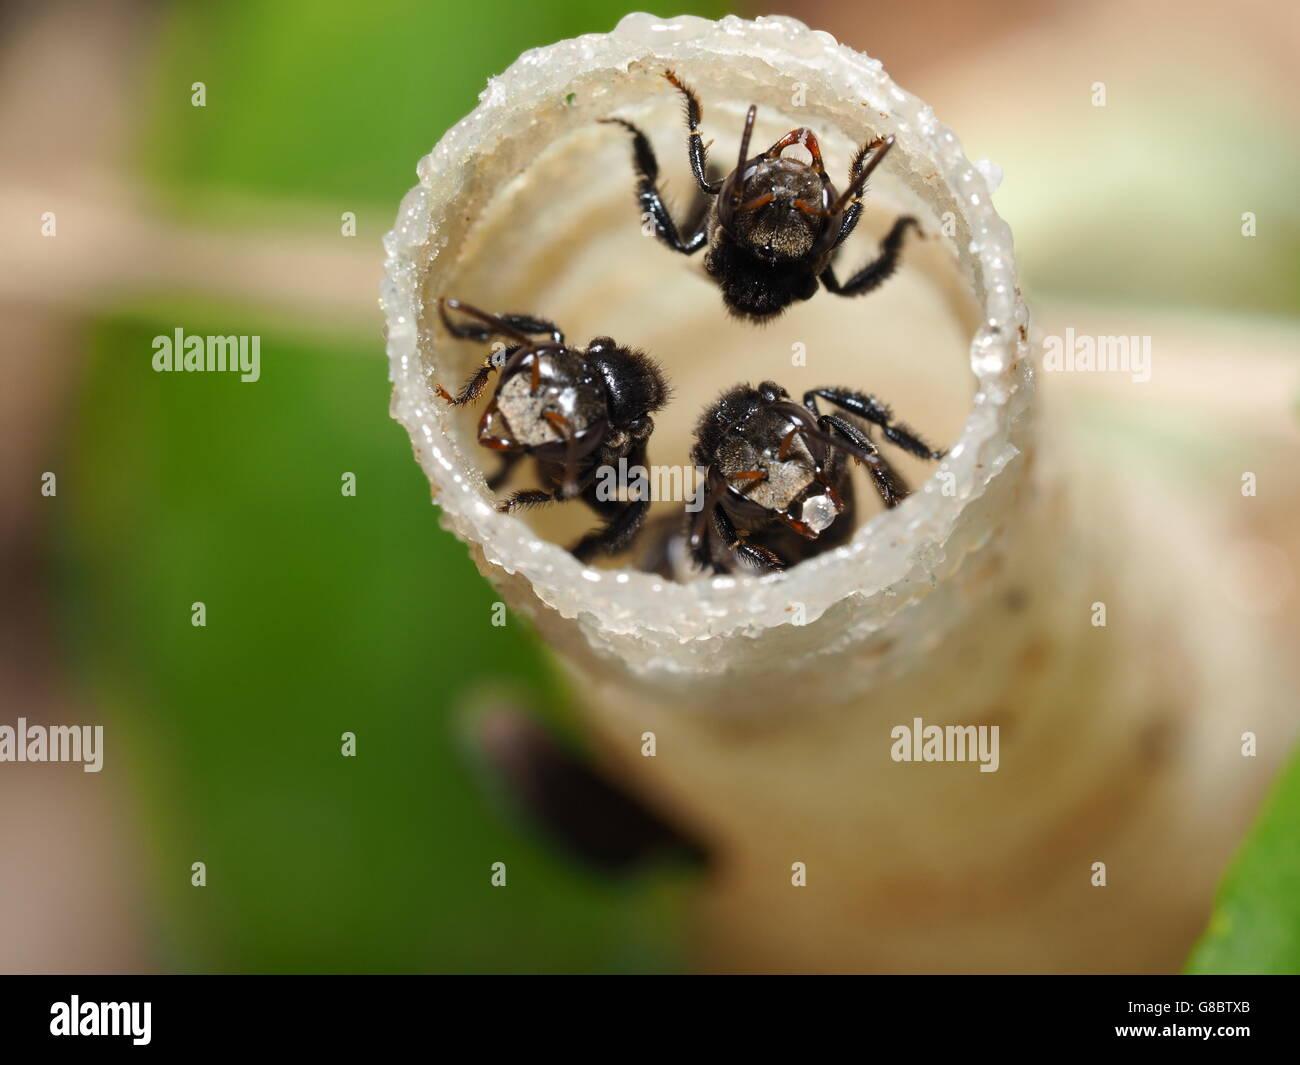 bee,bug,closeup,garden,honey,insects,macro,stingless,wild,worker - Stock Image